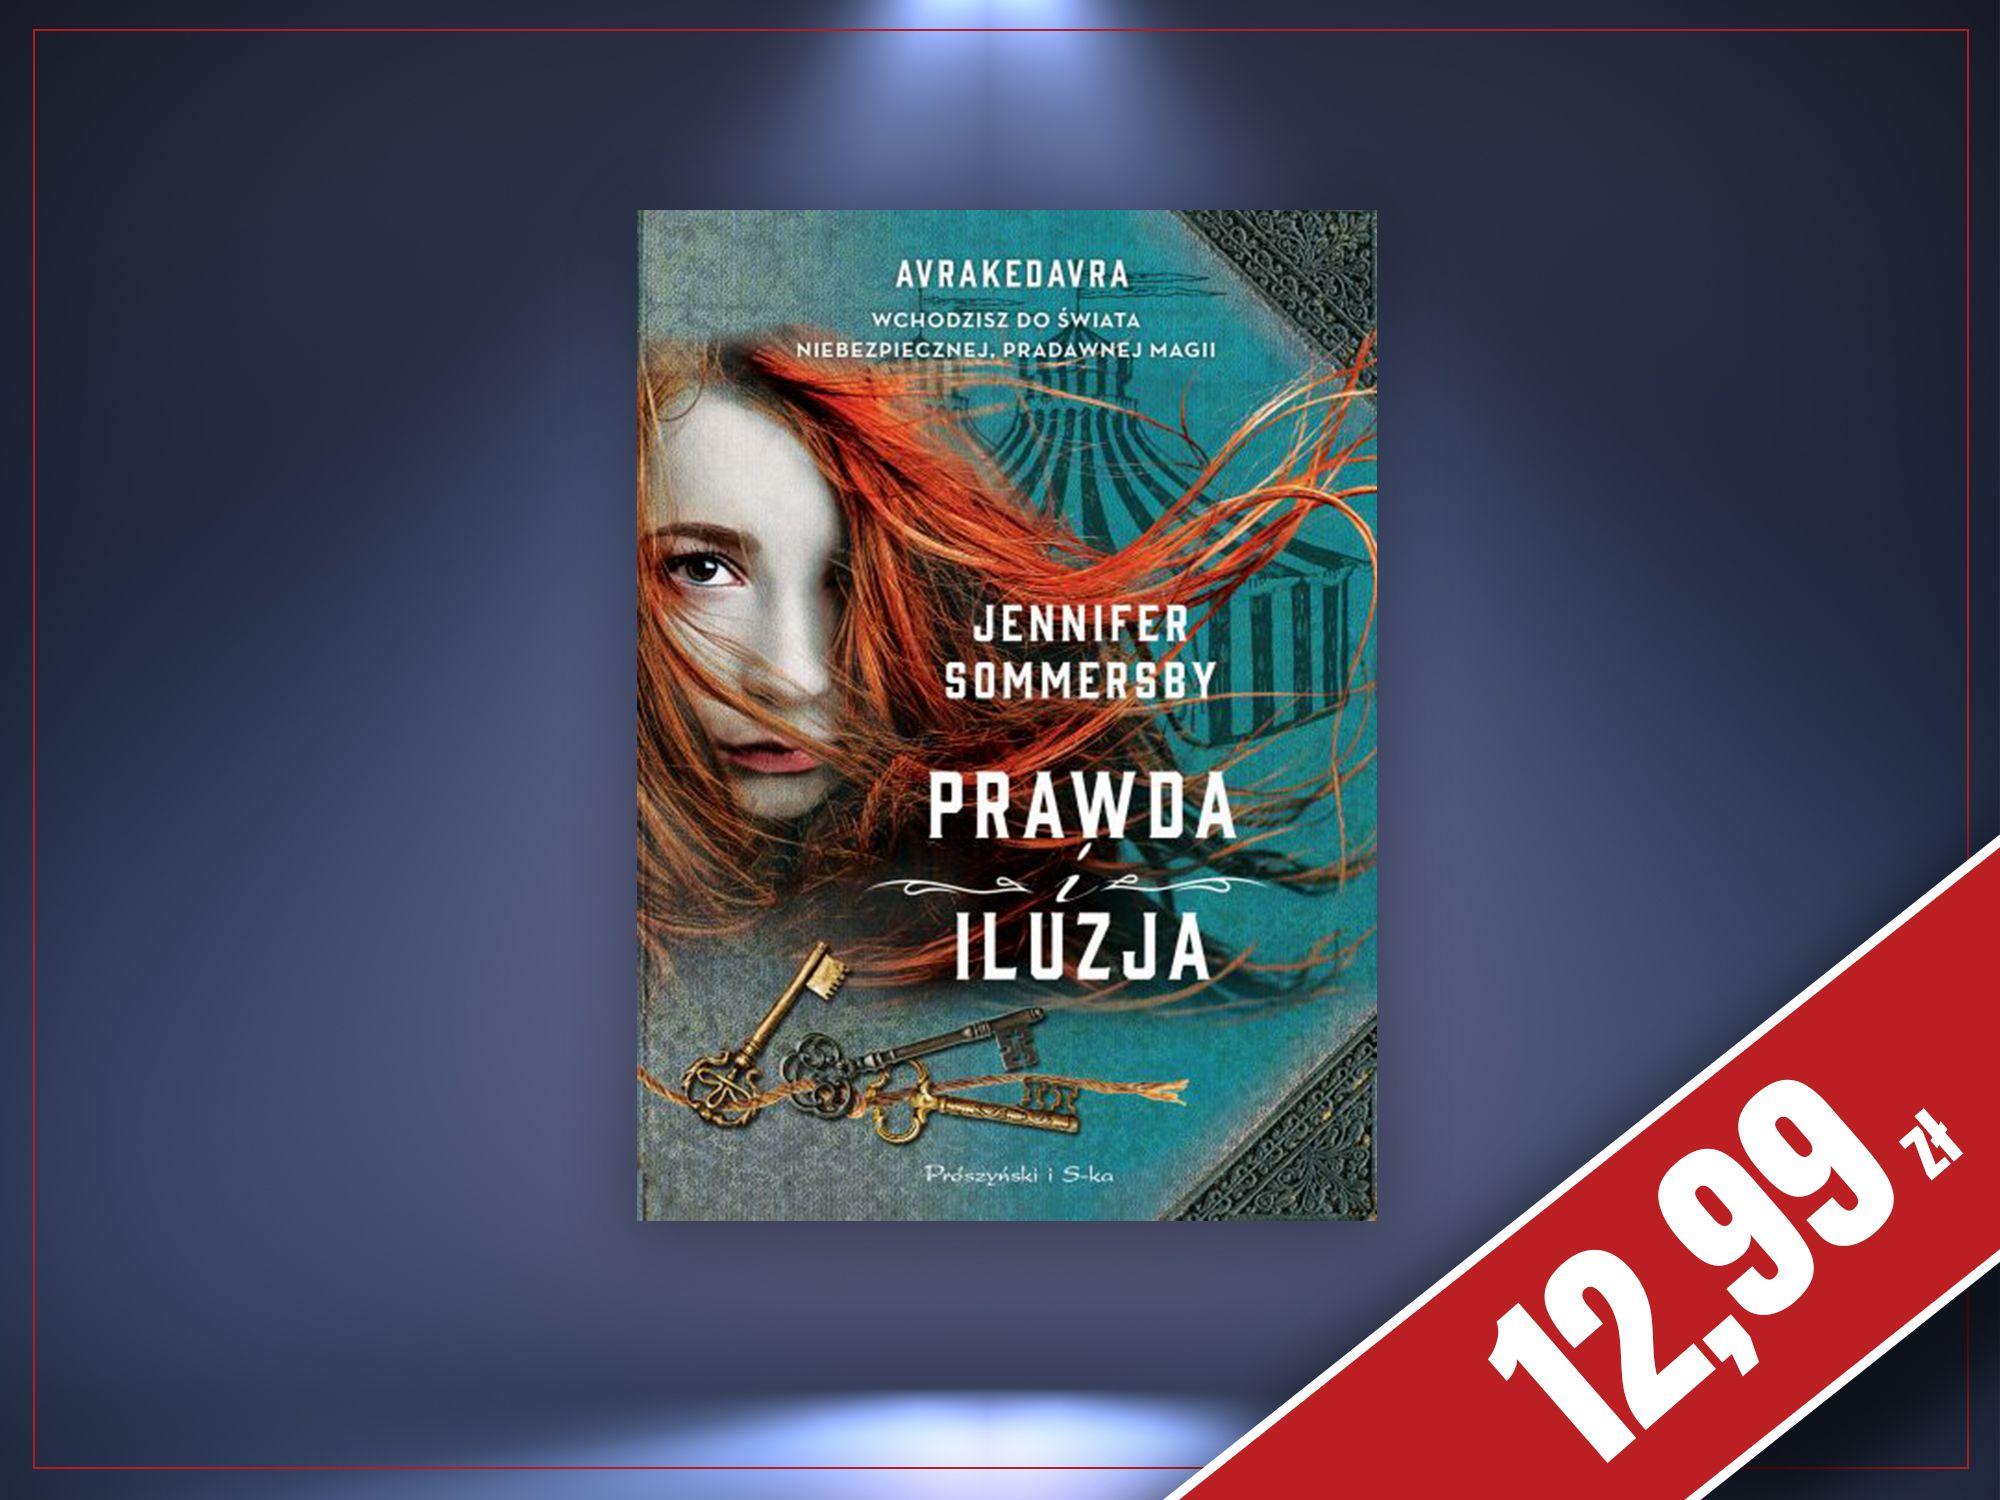 Prawda i iluzja, Jennifer Sommersby, zaczytanyksiazkoholik.pl